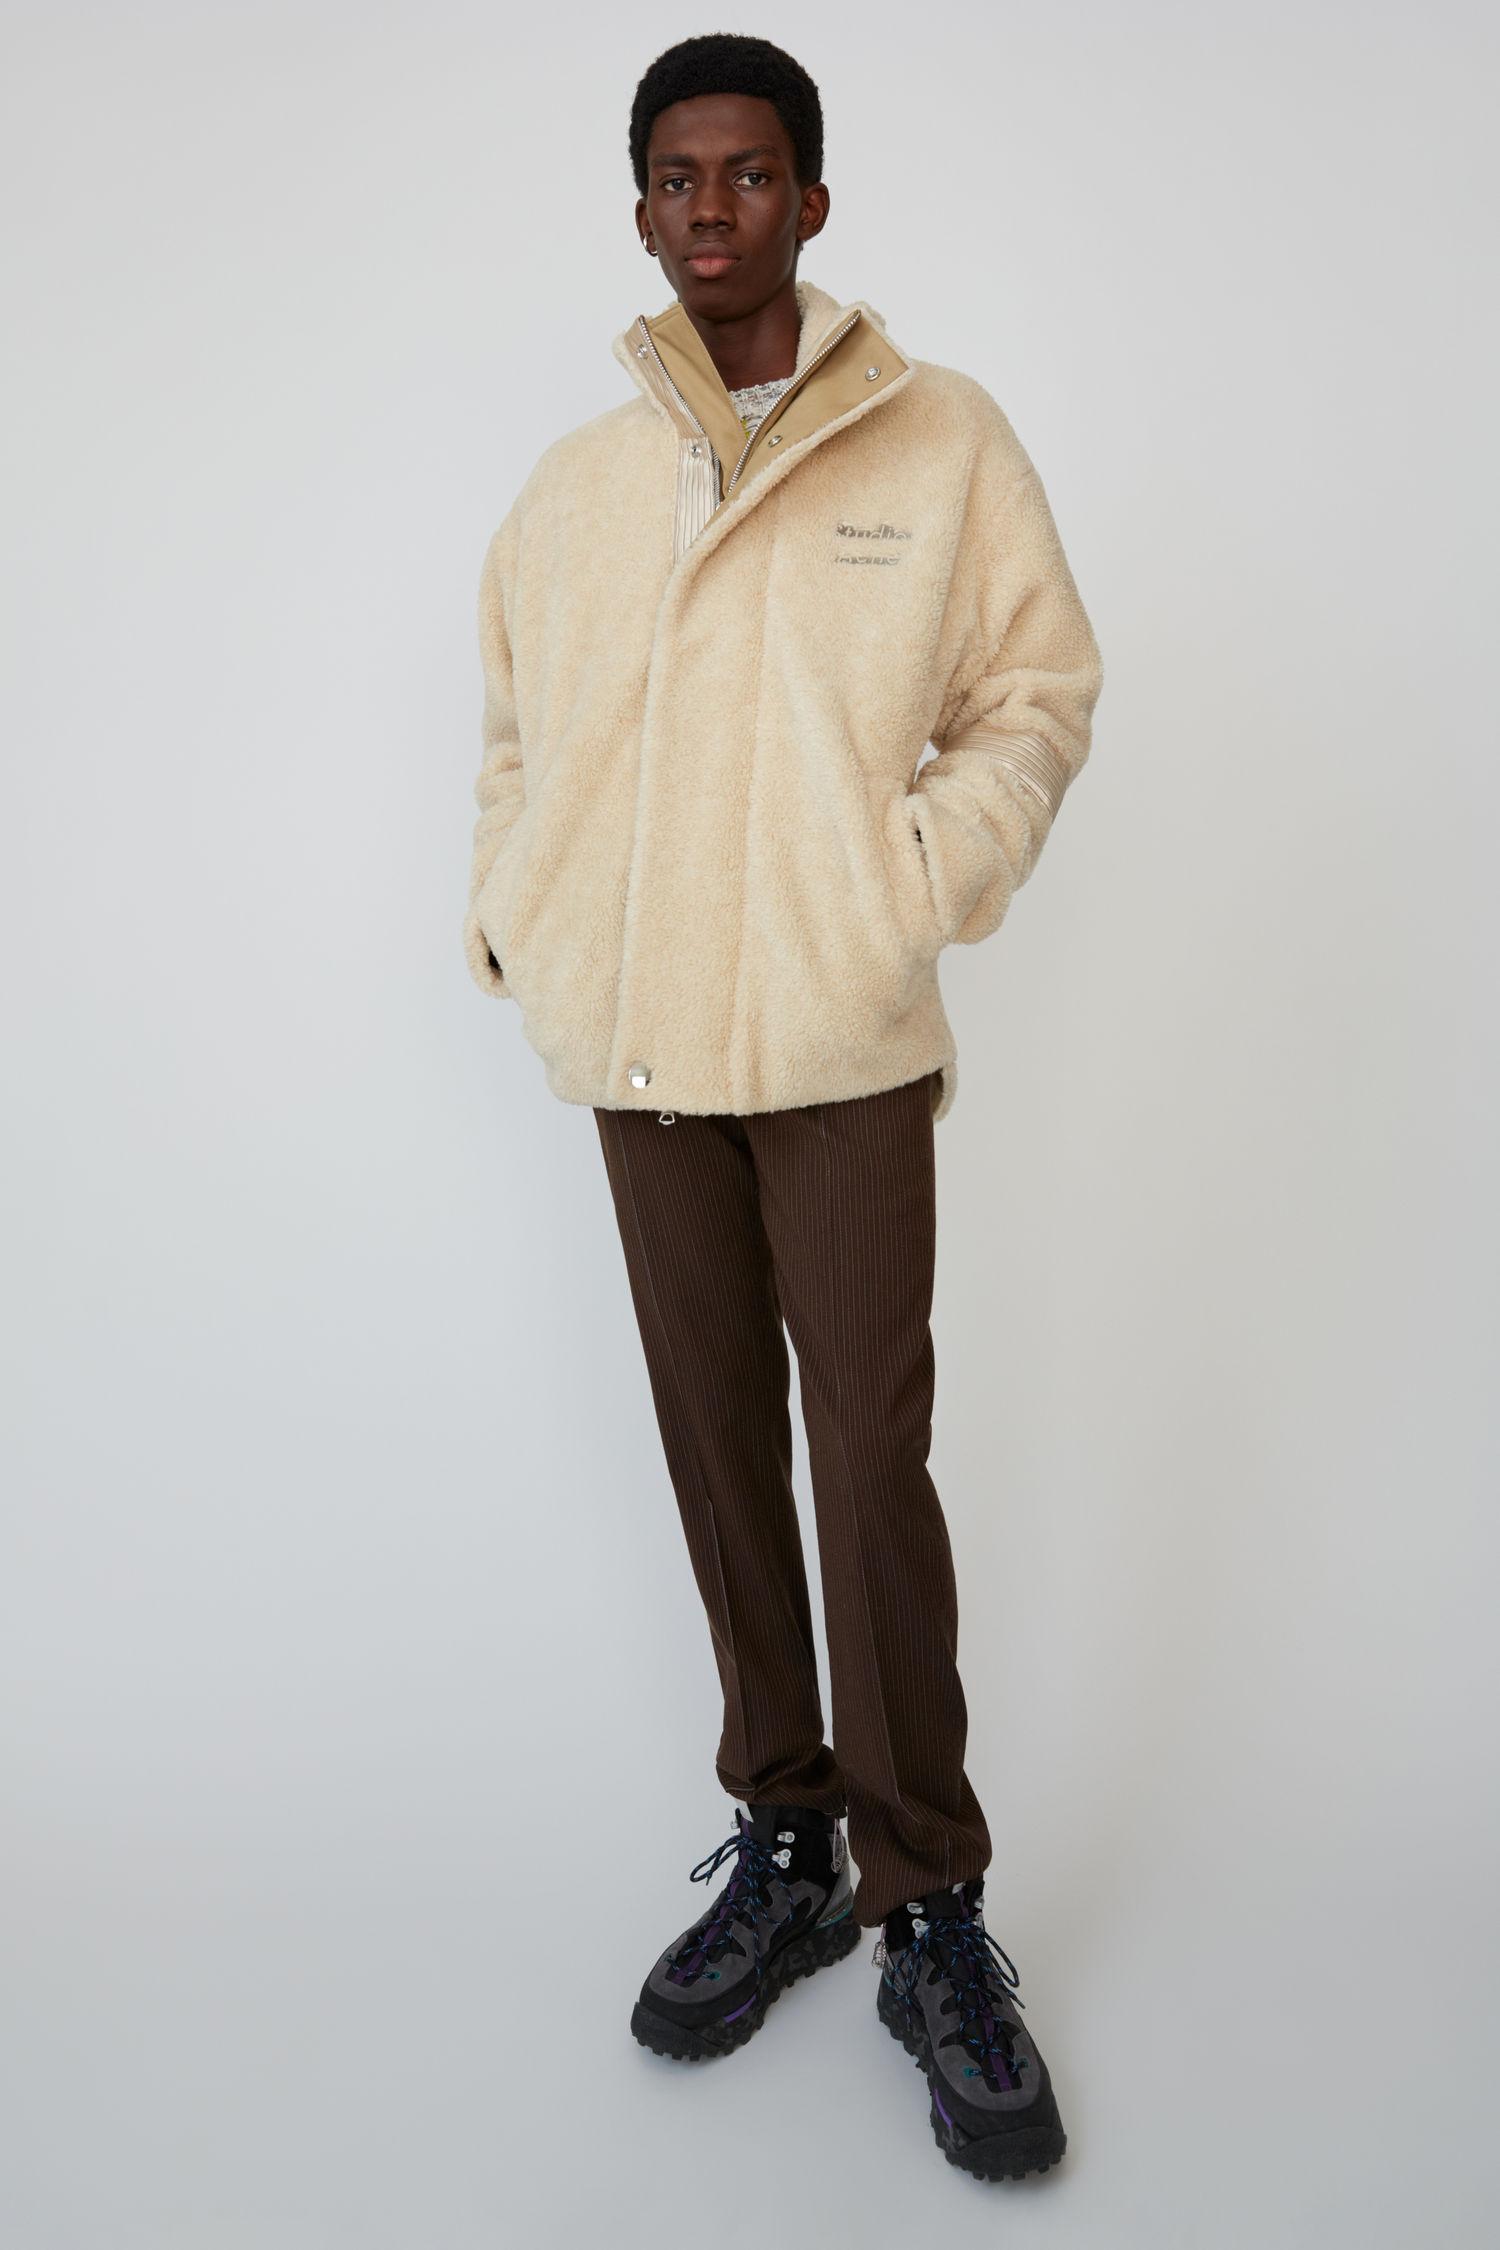 acne_studios_Oversized_fleece_jacket_ecru_beige_1.jpg